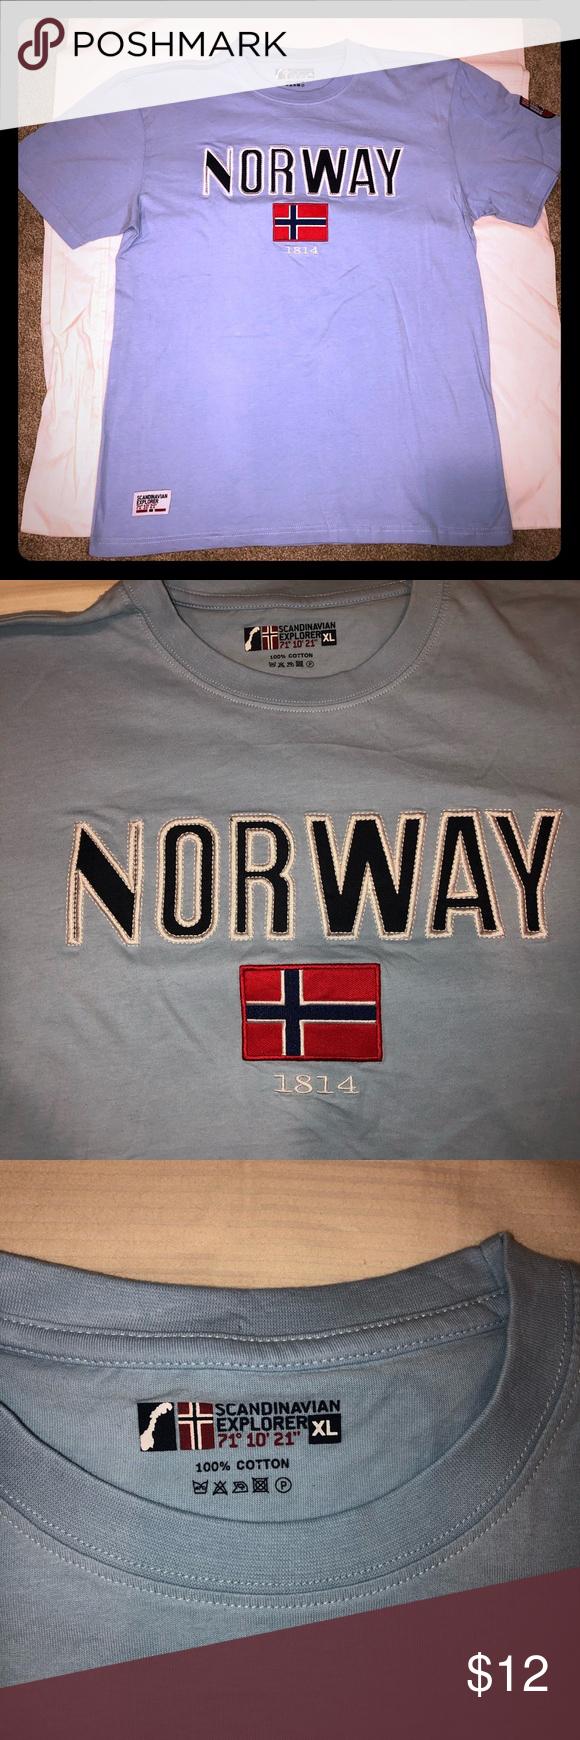 Scandinavian Explorer Woman S T Shirt Flawless Beautiful Scandinavian Explorer T Shirt Flawless Norway Spelled O Clothes Design Explore Shirt Fashion Design